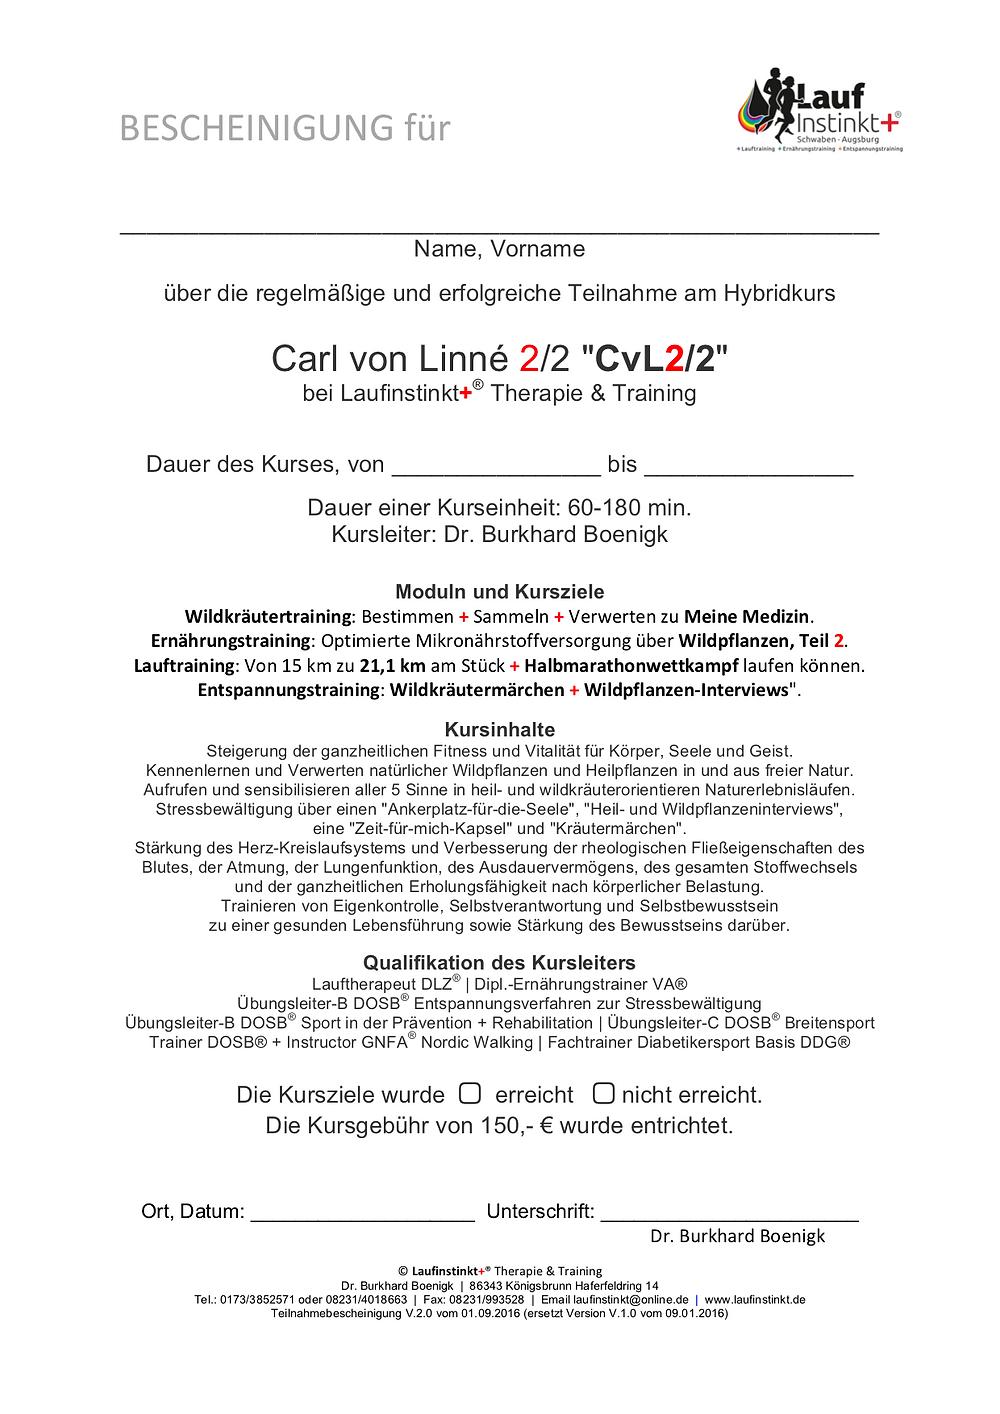 Laufinstinkt.de - Hybridkurs CvL1/2 2018 - Bild 3